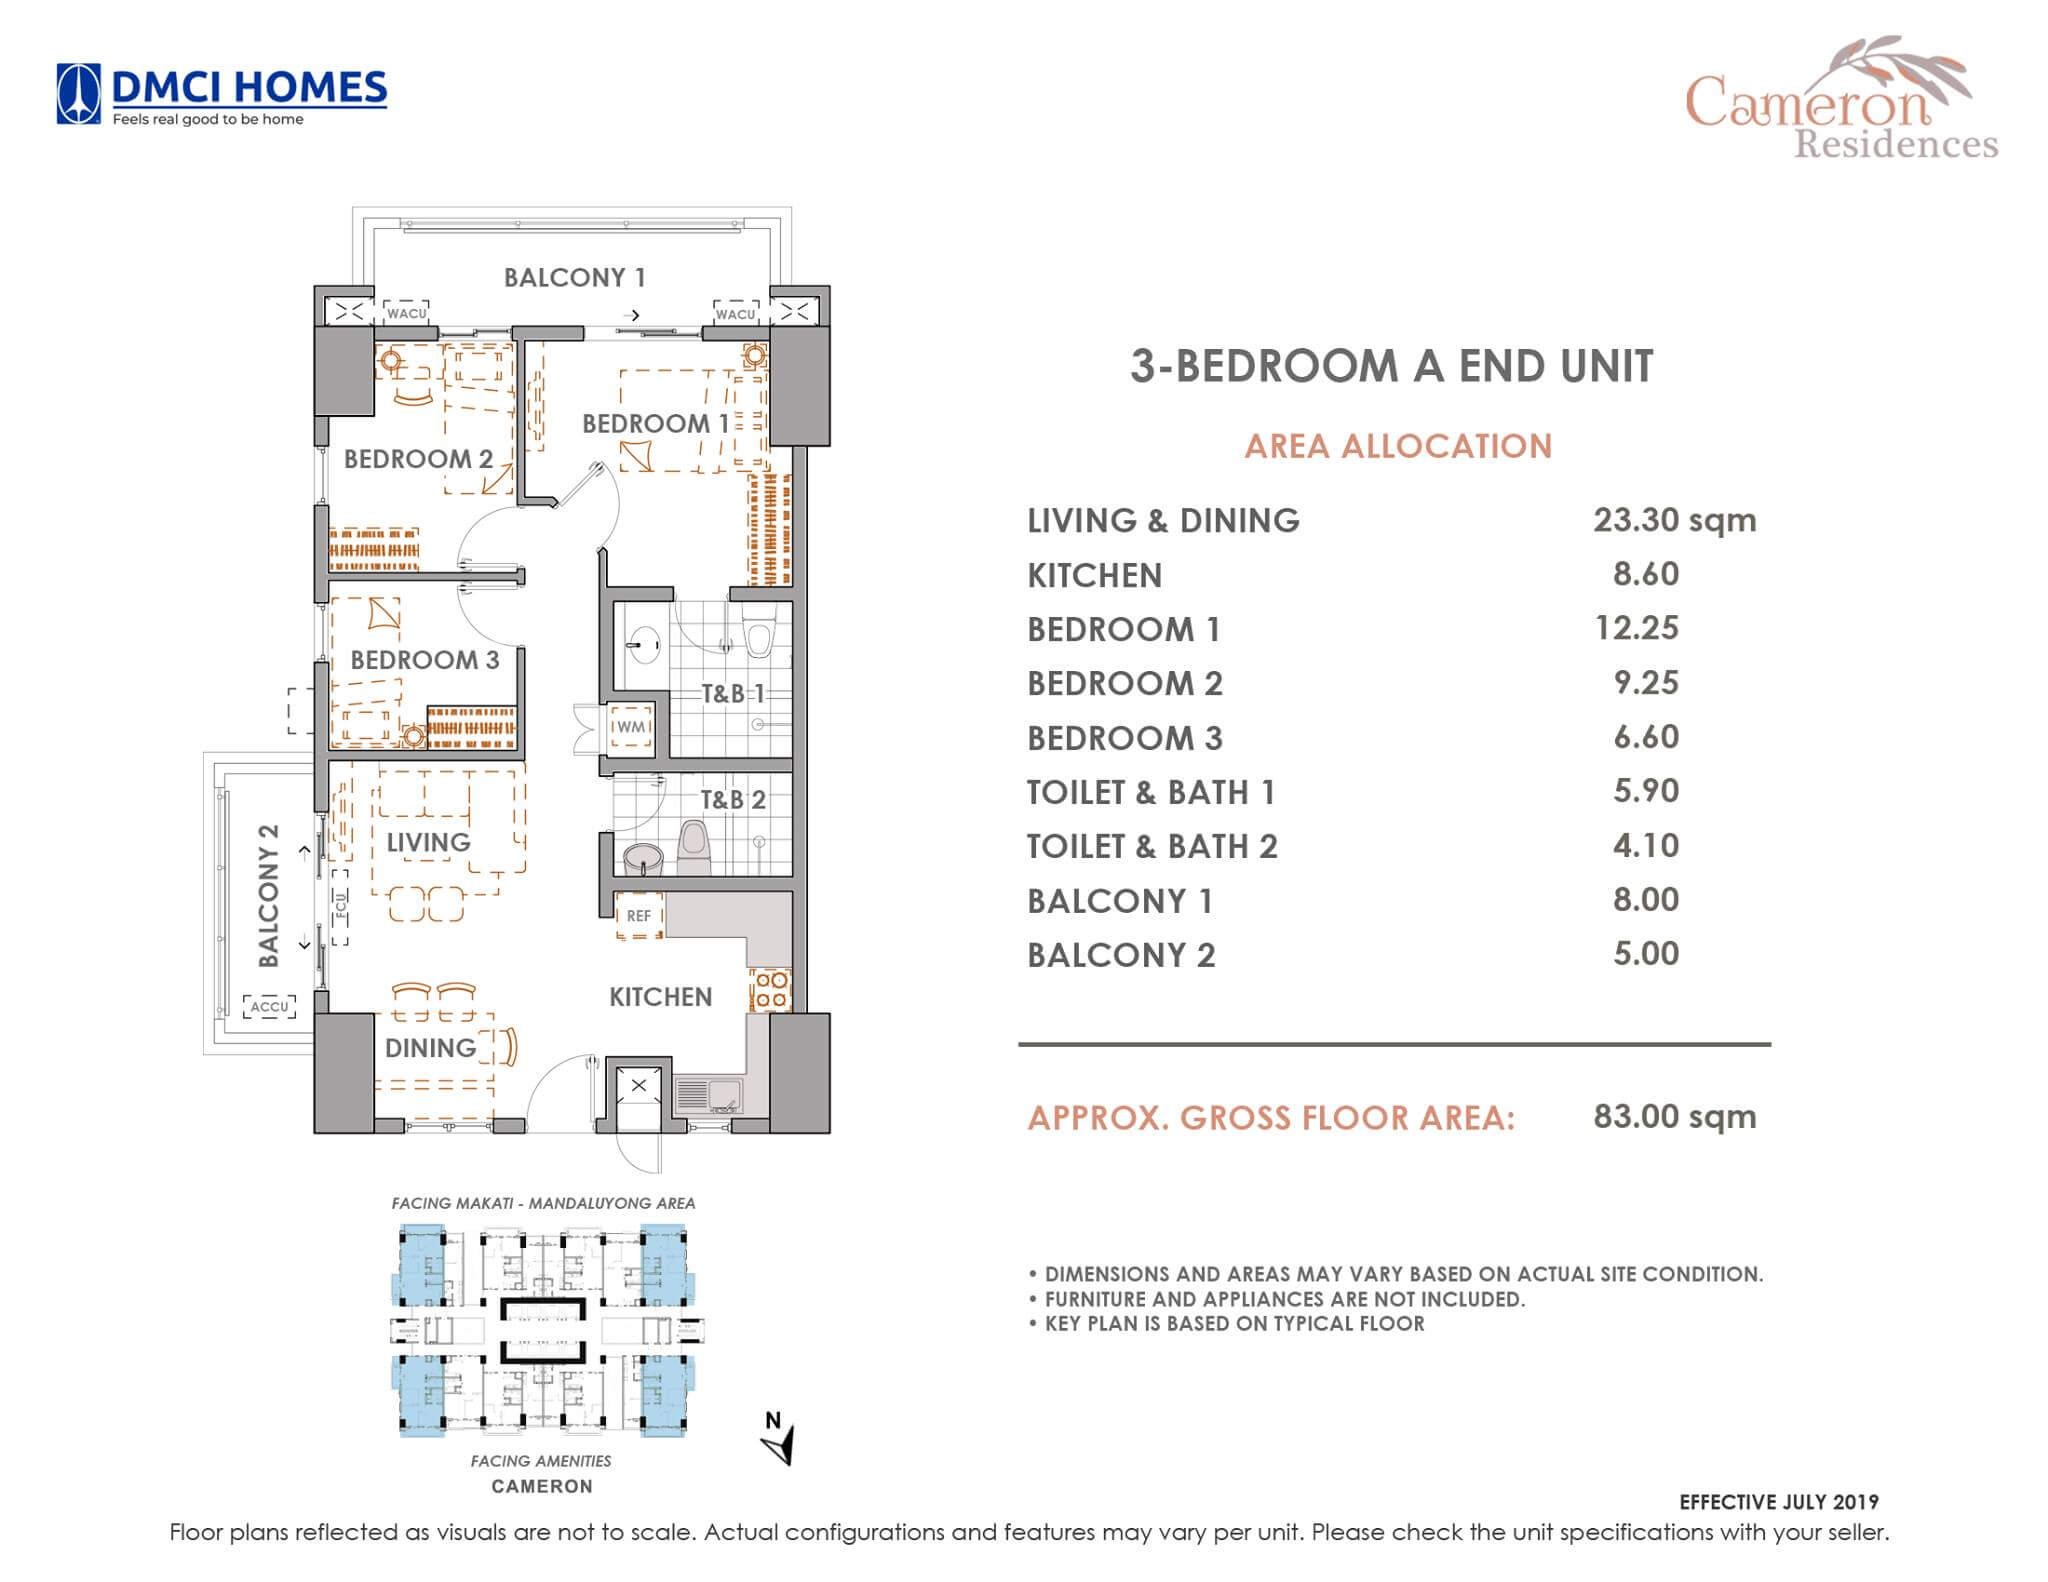 Cameron DMCI 3 Bedroom Unit Layout